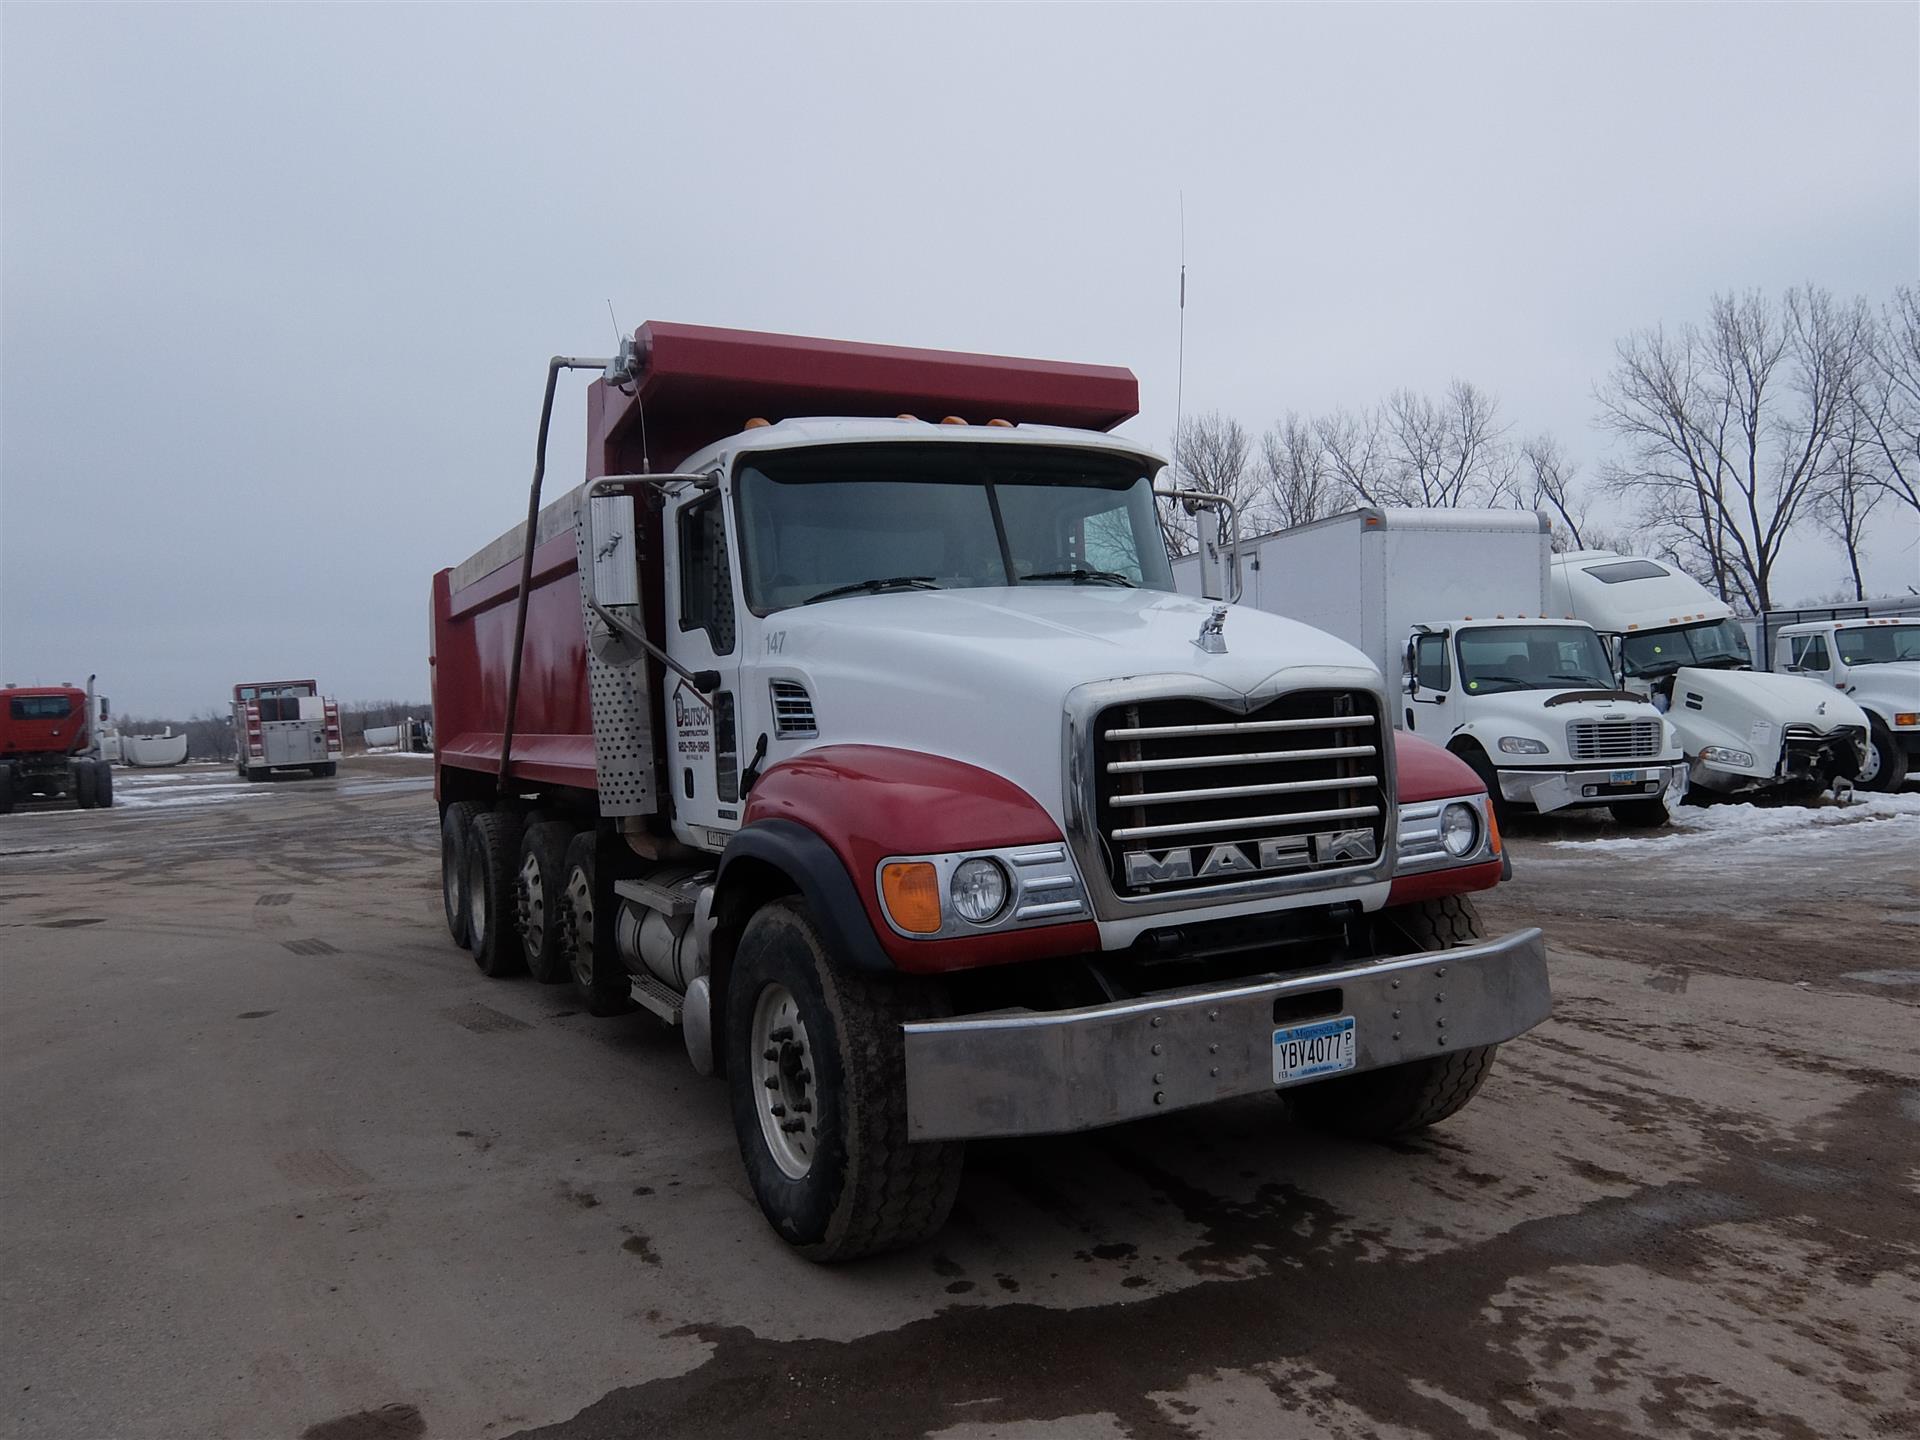 2005 Mack cv713 for sale-59109198